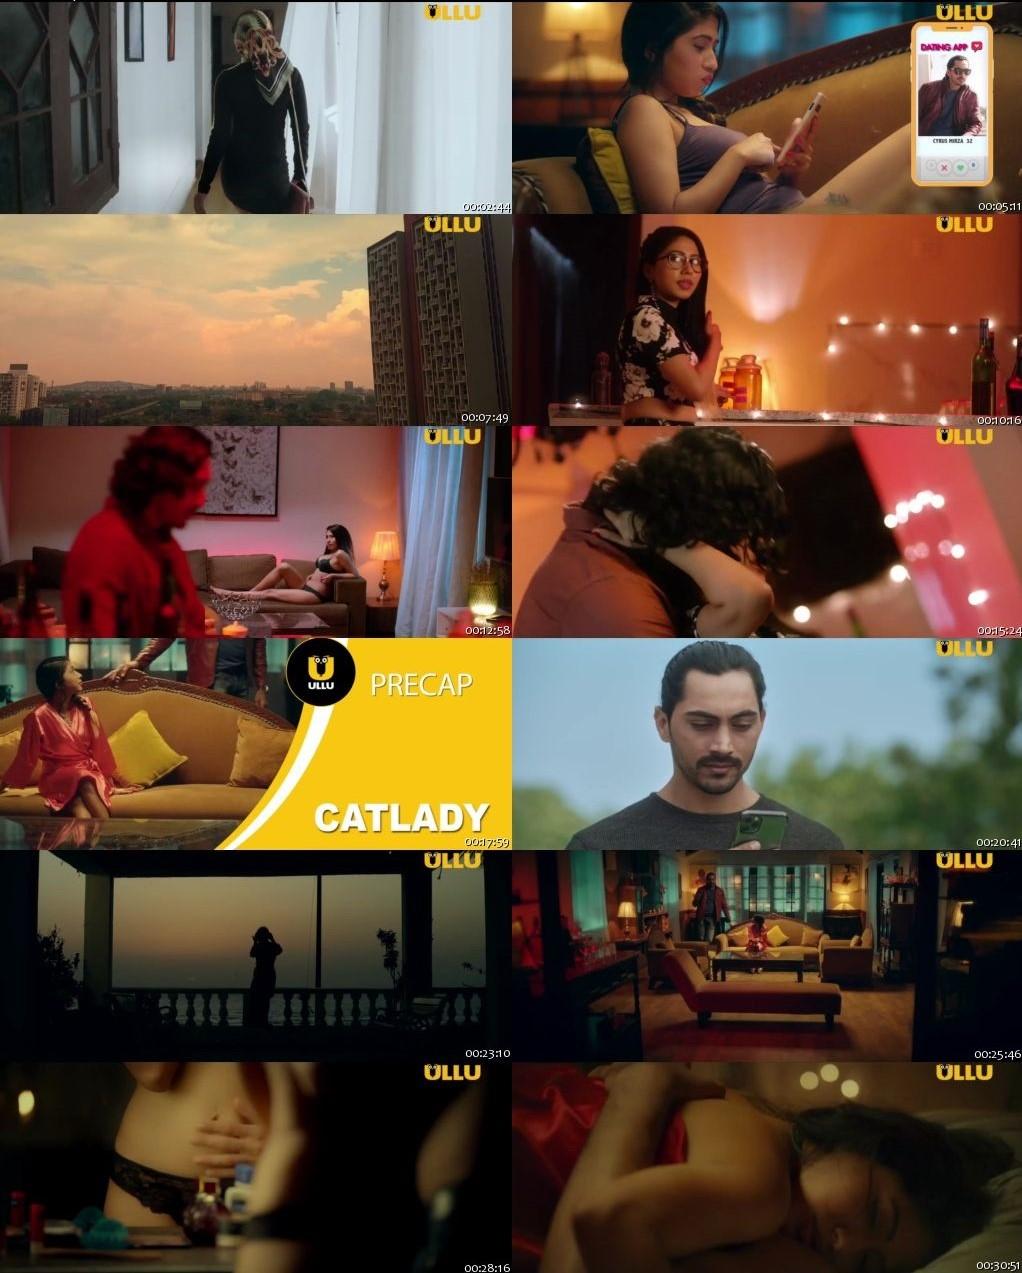 Catlady 2020 Hindi Episode HDRip 720p